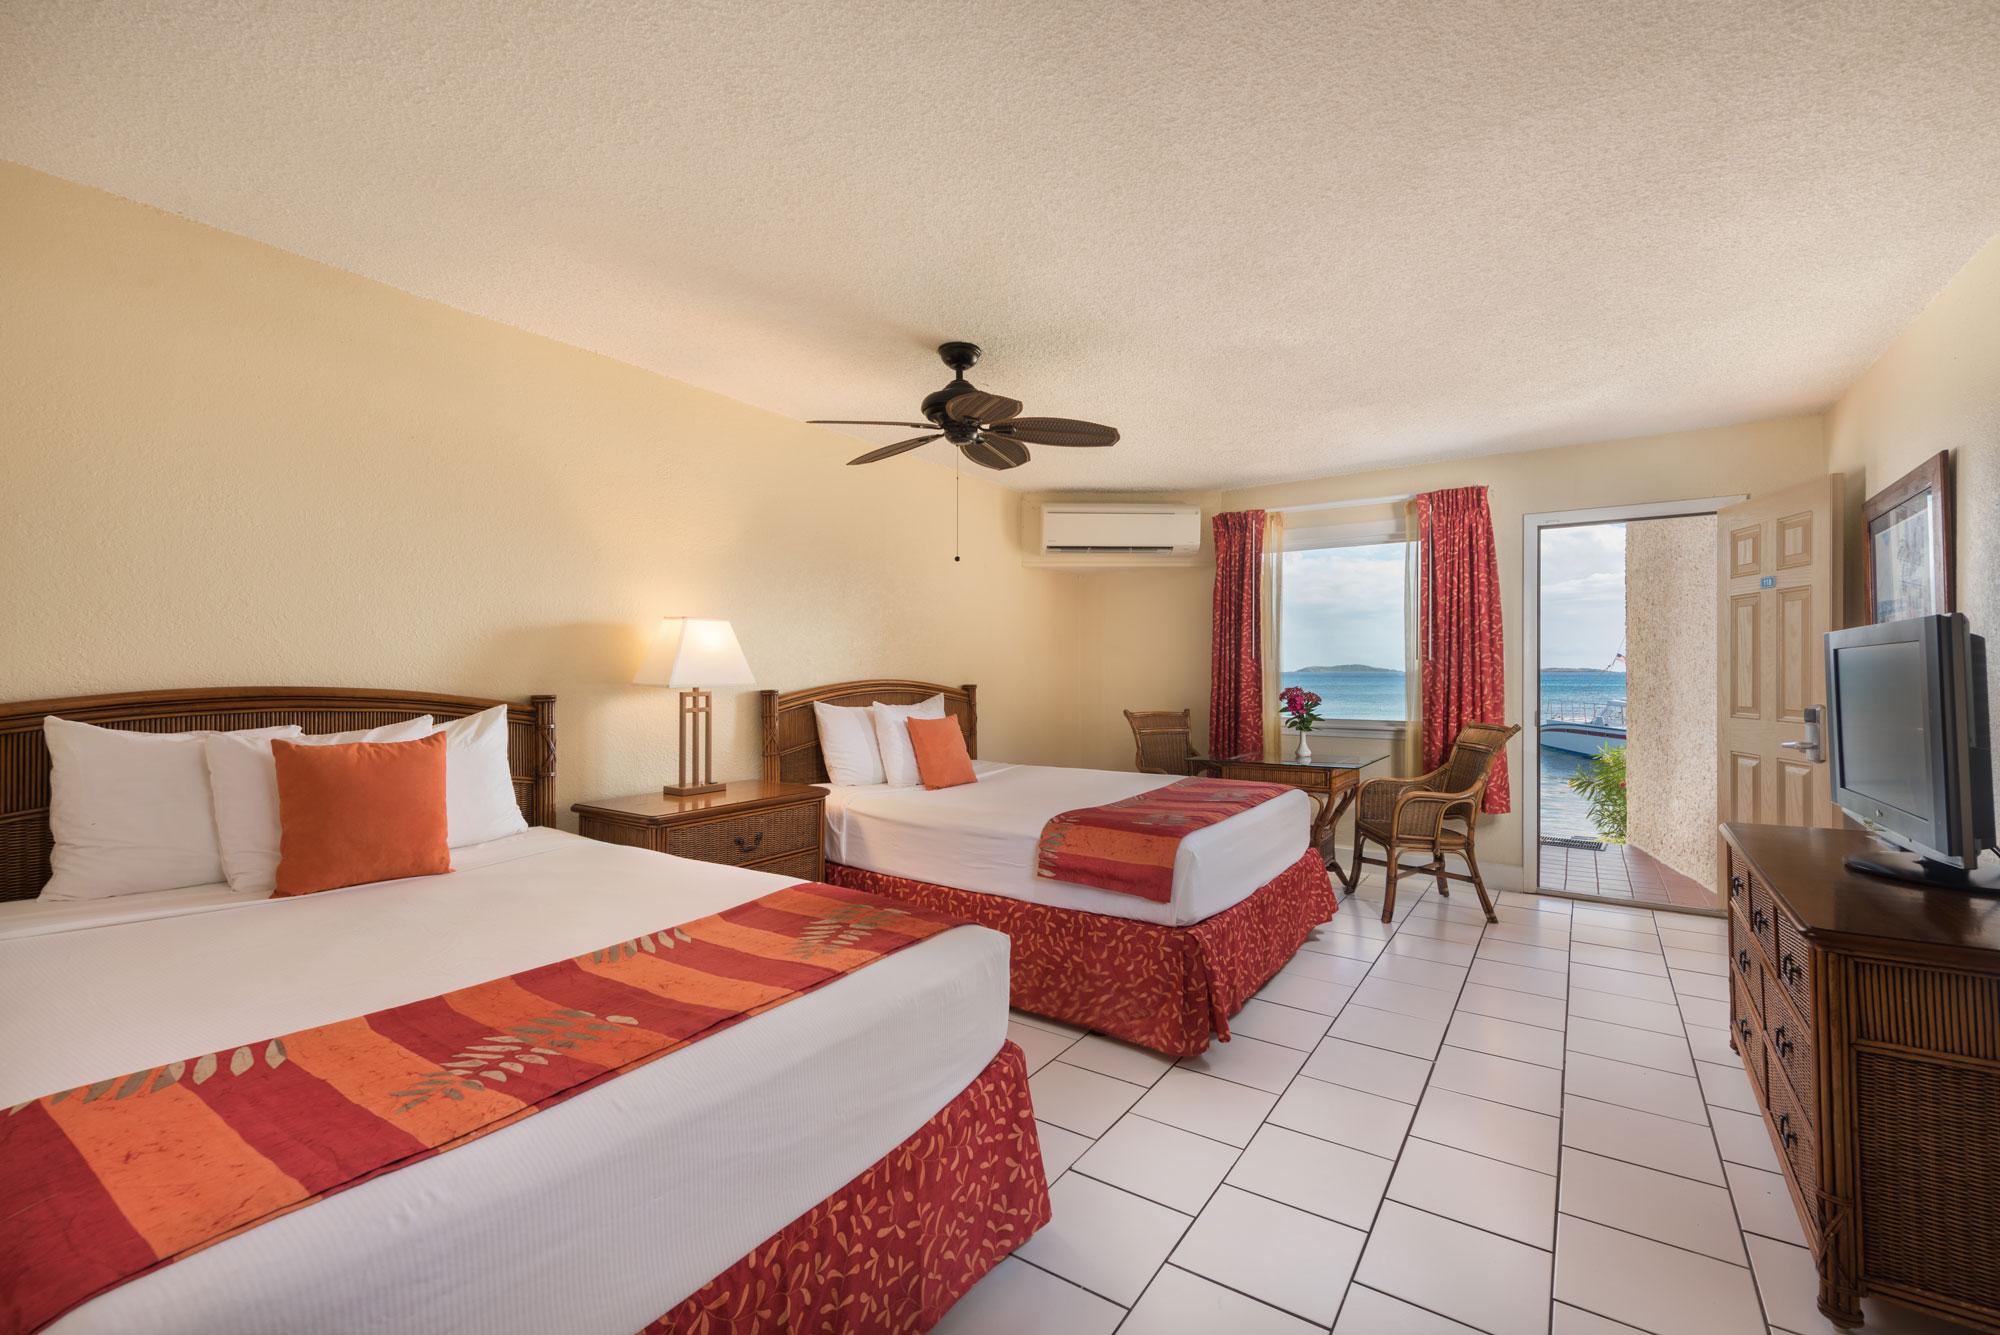 Beachfront Hotel in St Thomas, US Virgin Islands